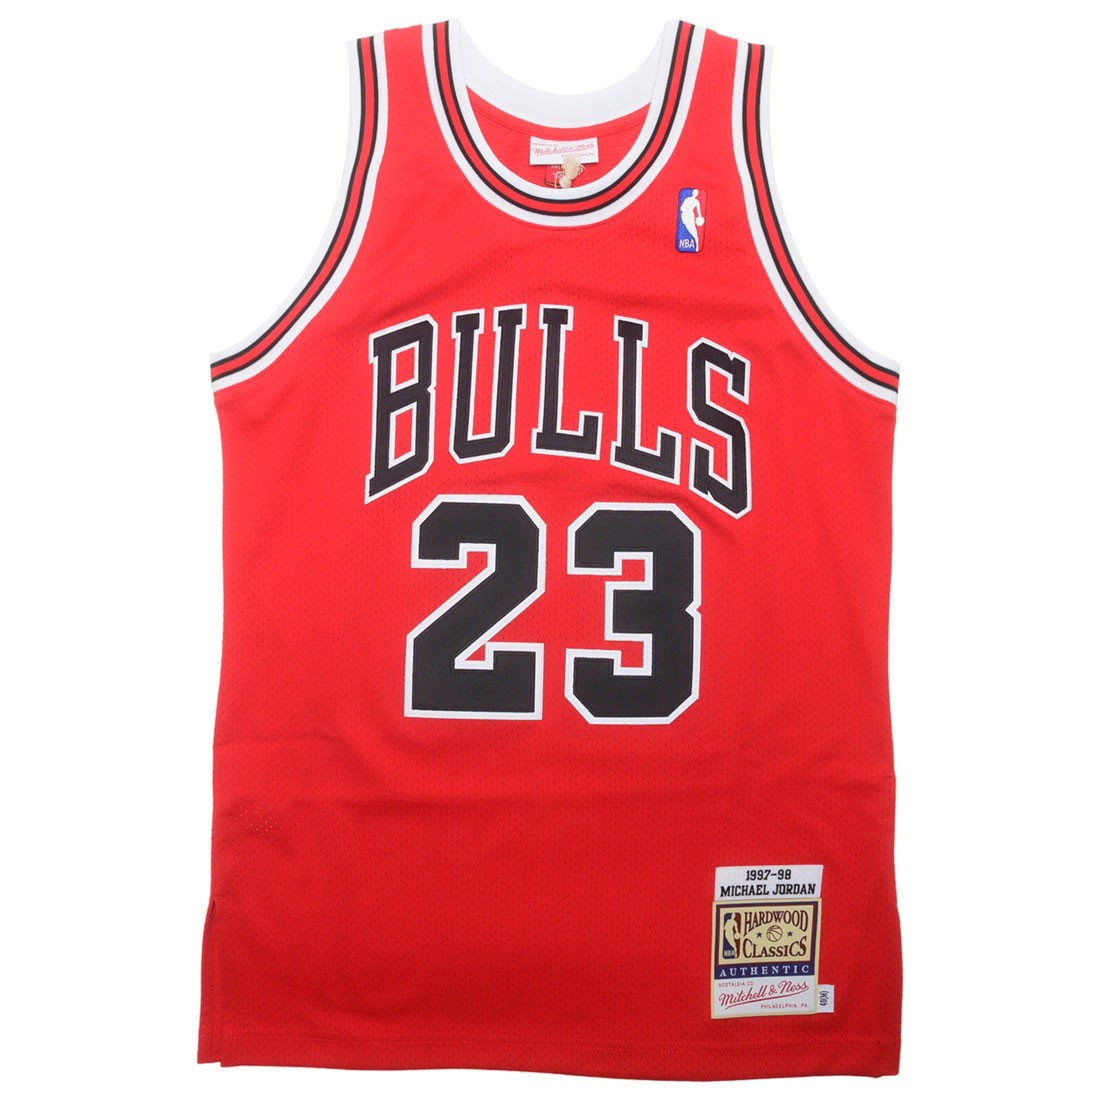 Mitchell And Ness x NBA Men Chicago Bulls Michael Jordan Jersey - Road 97 (black)